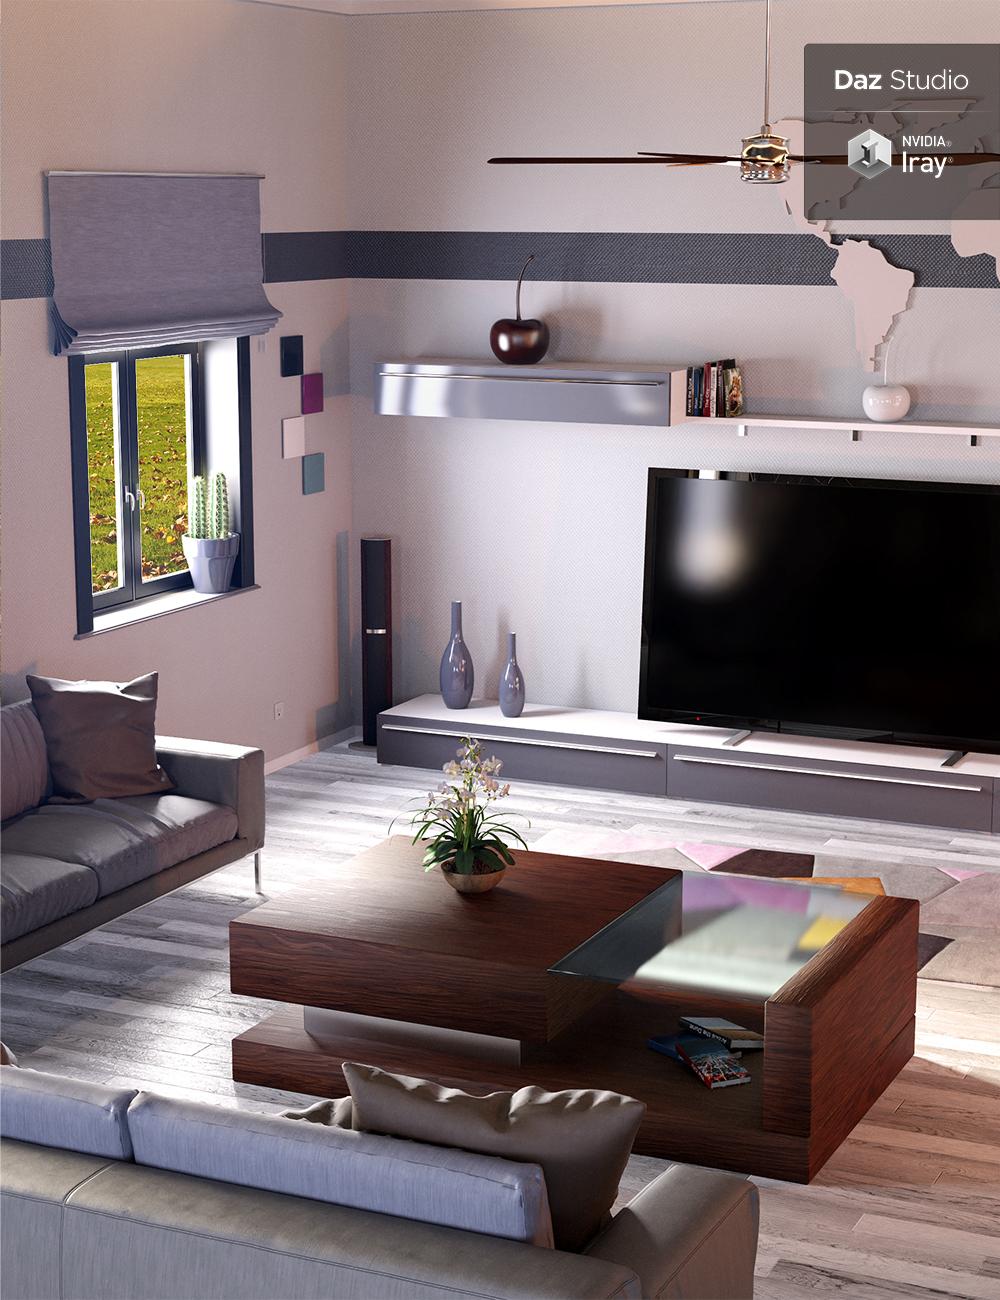 Modern Appartment by: PrefoX, 3D Models by Daz 3D